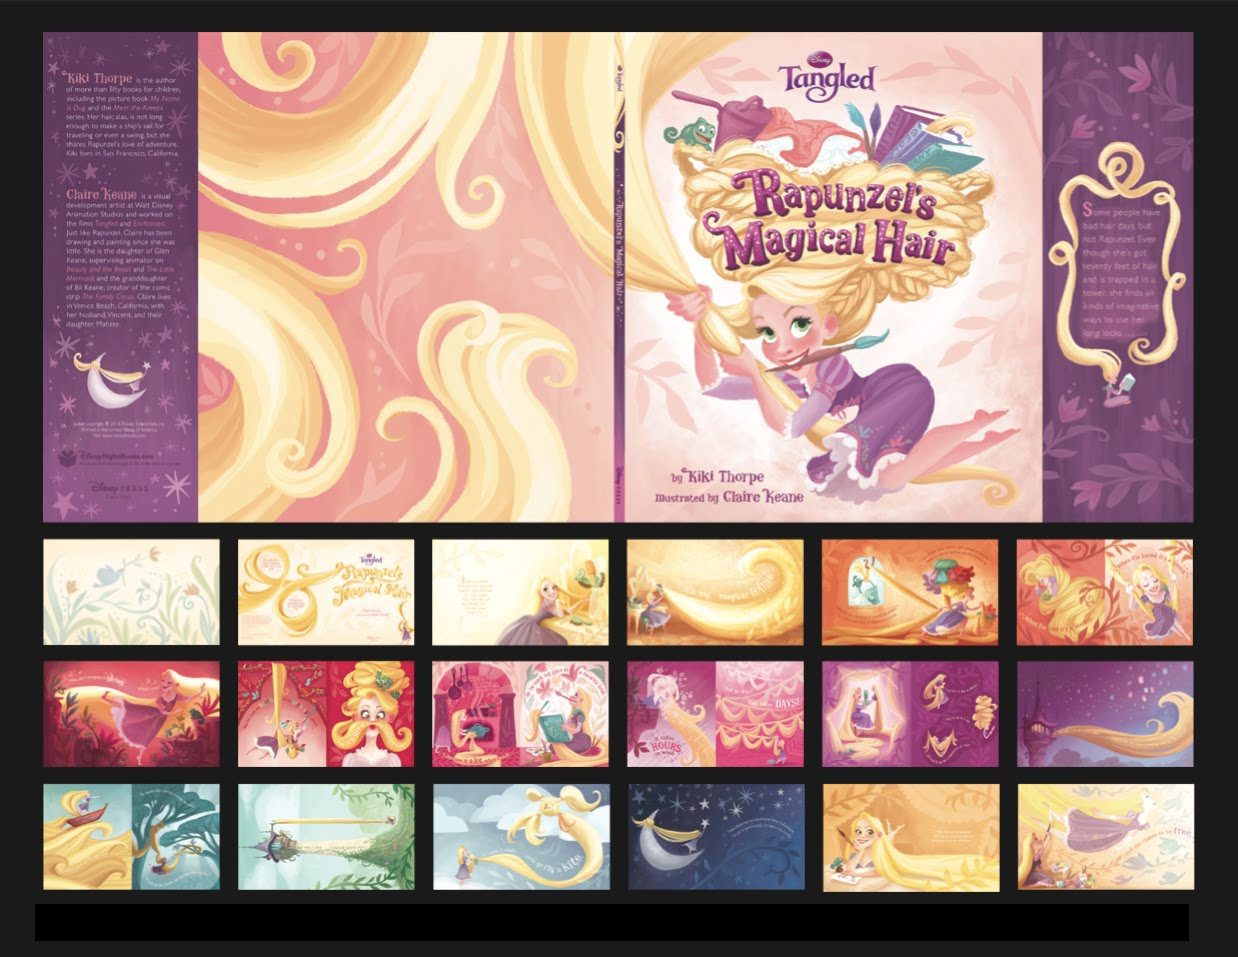 Dibujos de Enredados - Rapunzel para imprimir